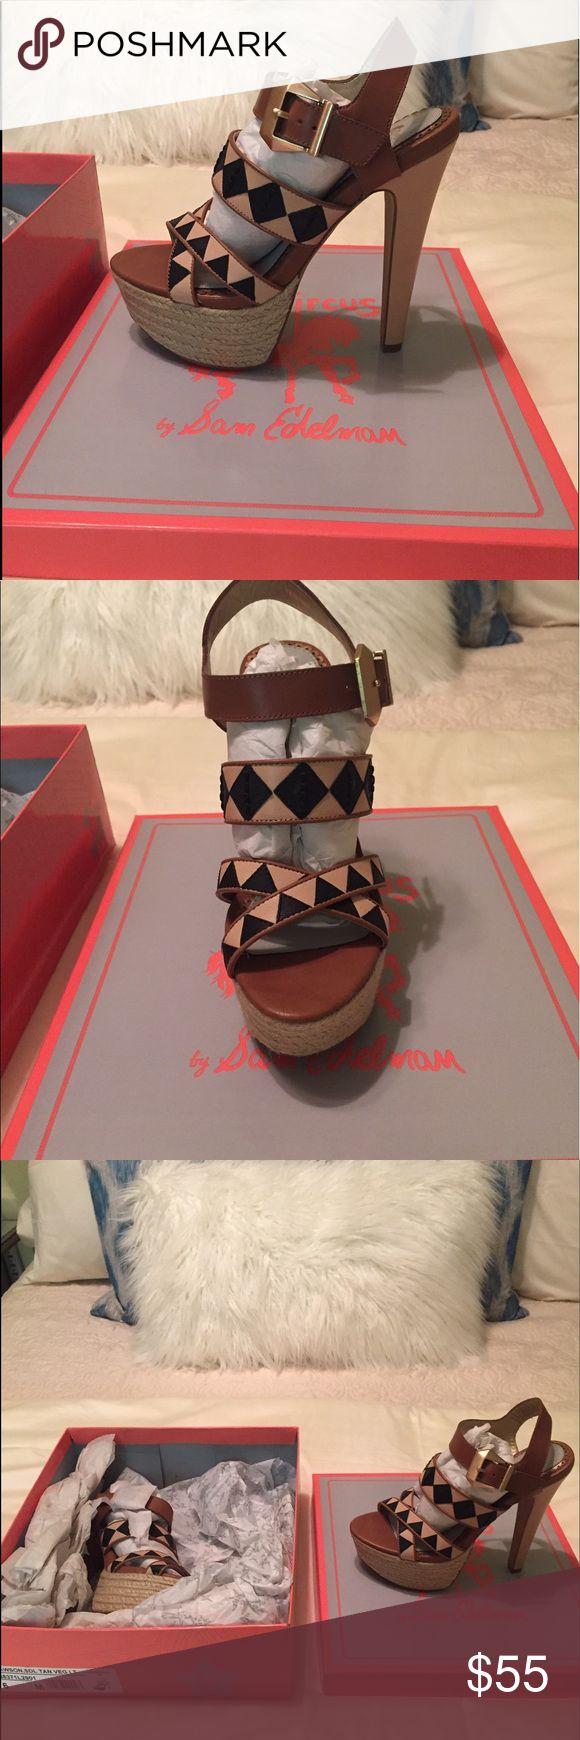 Sam Edelman Heels Size 6 Sam Edelman Heels Size 6 Sam Edelman Shoes Heels